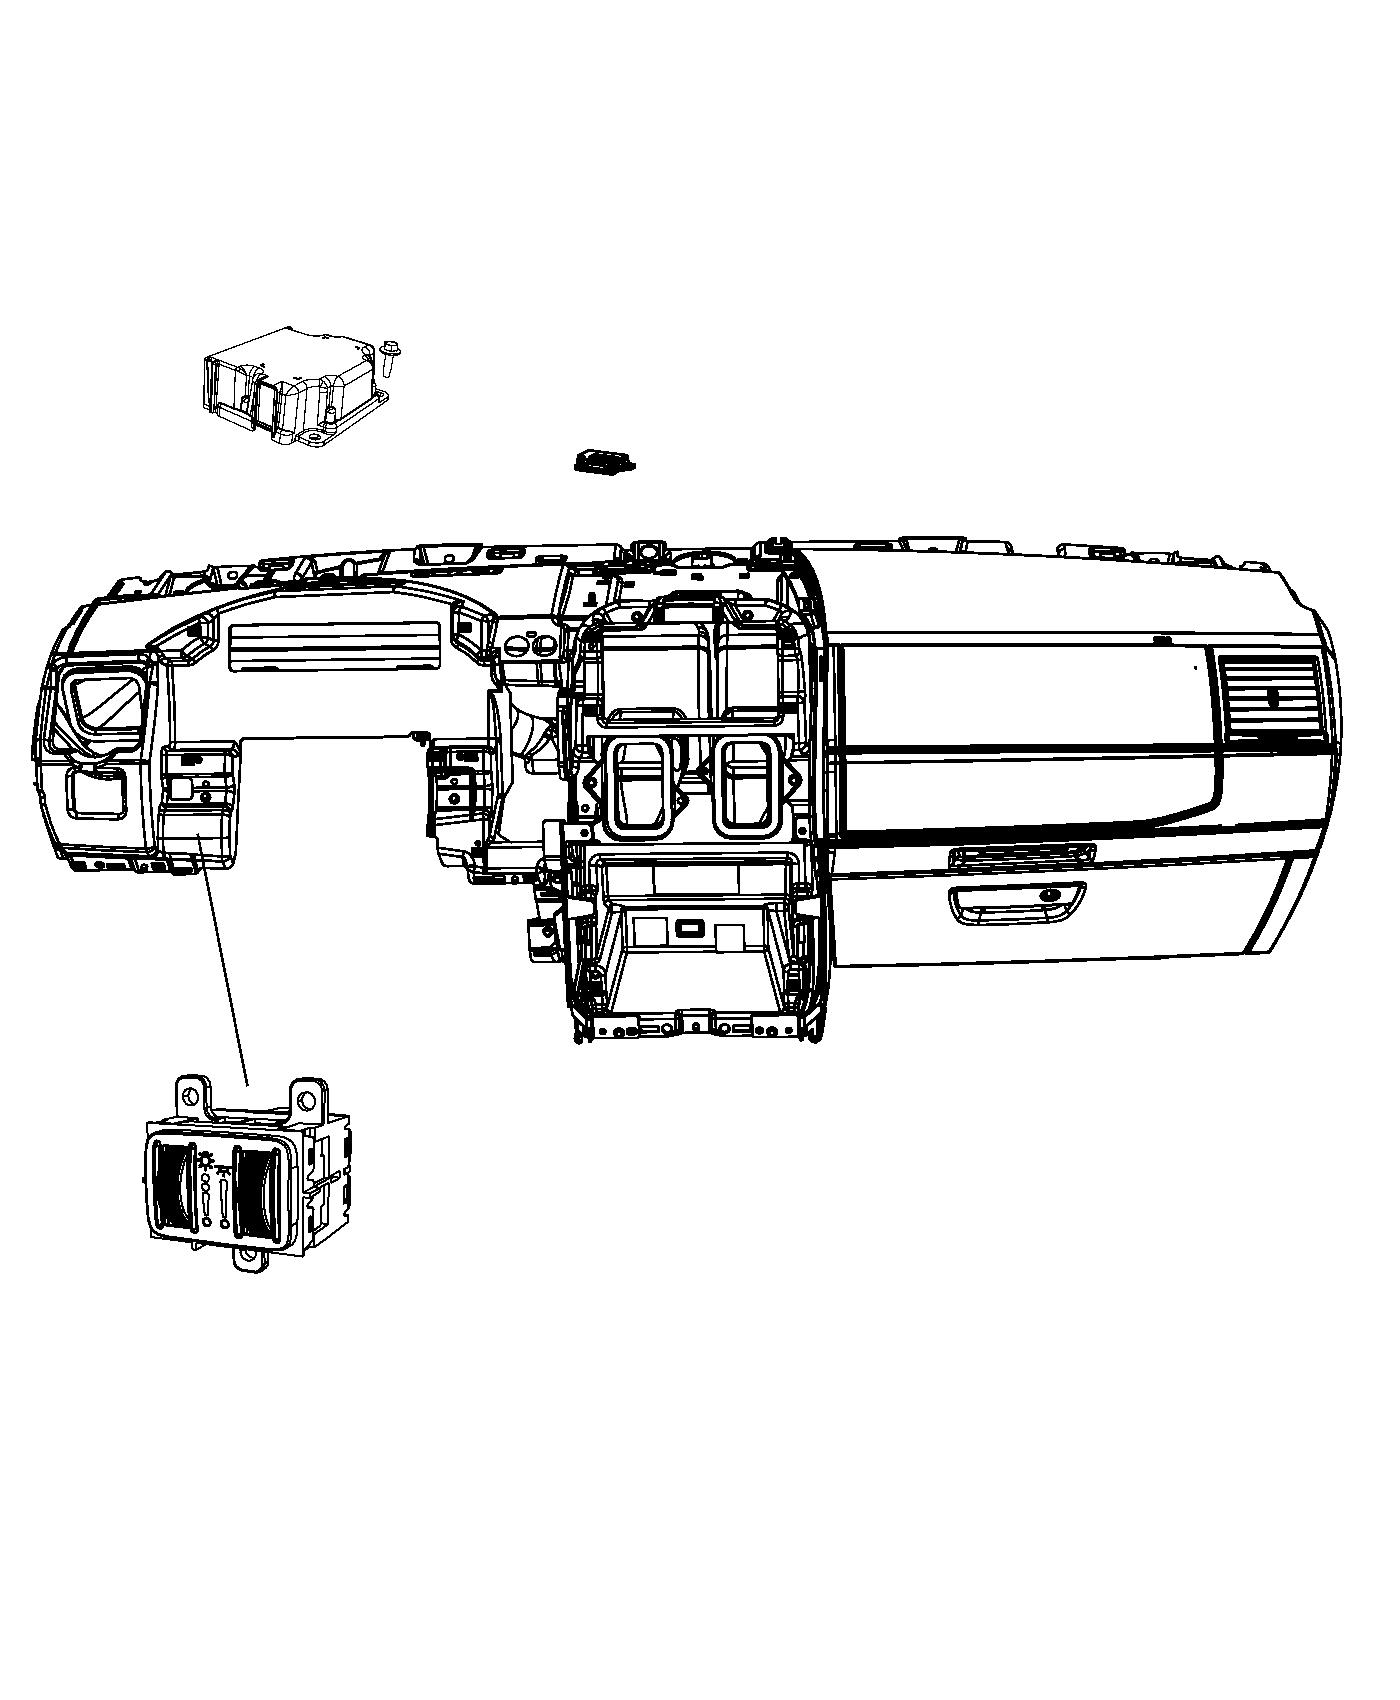 Dodge Grand Caravan Module. Electronic pedestrian